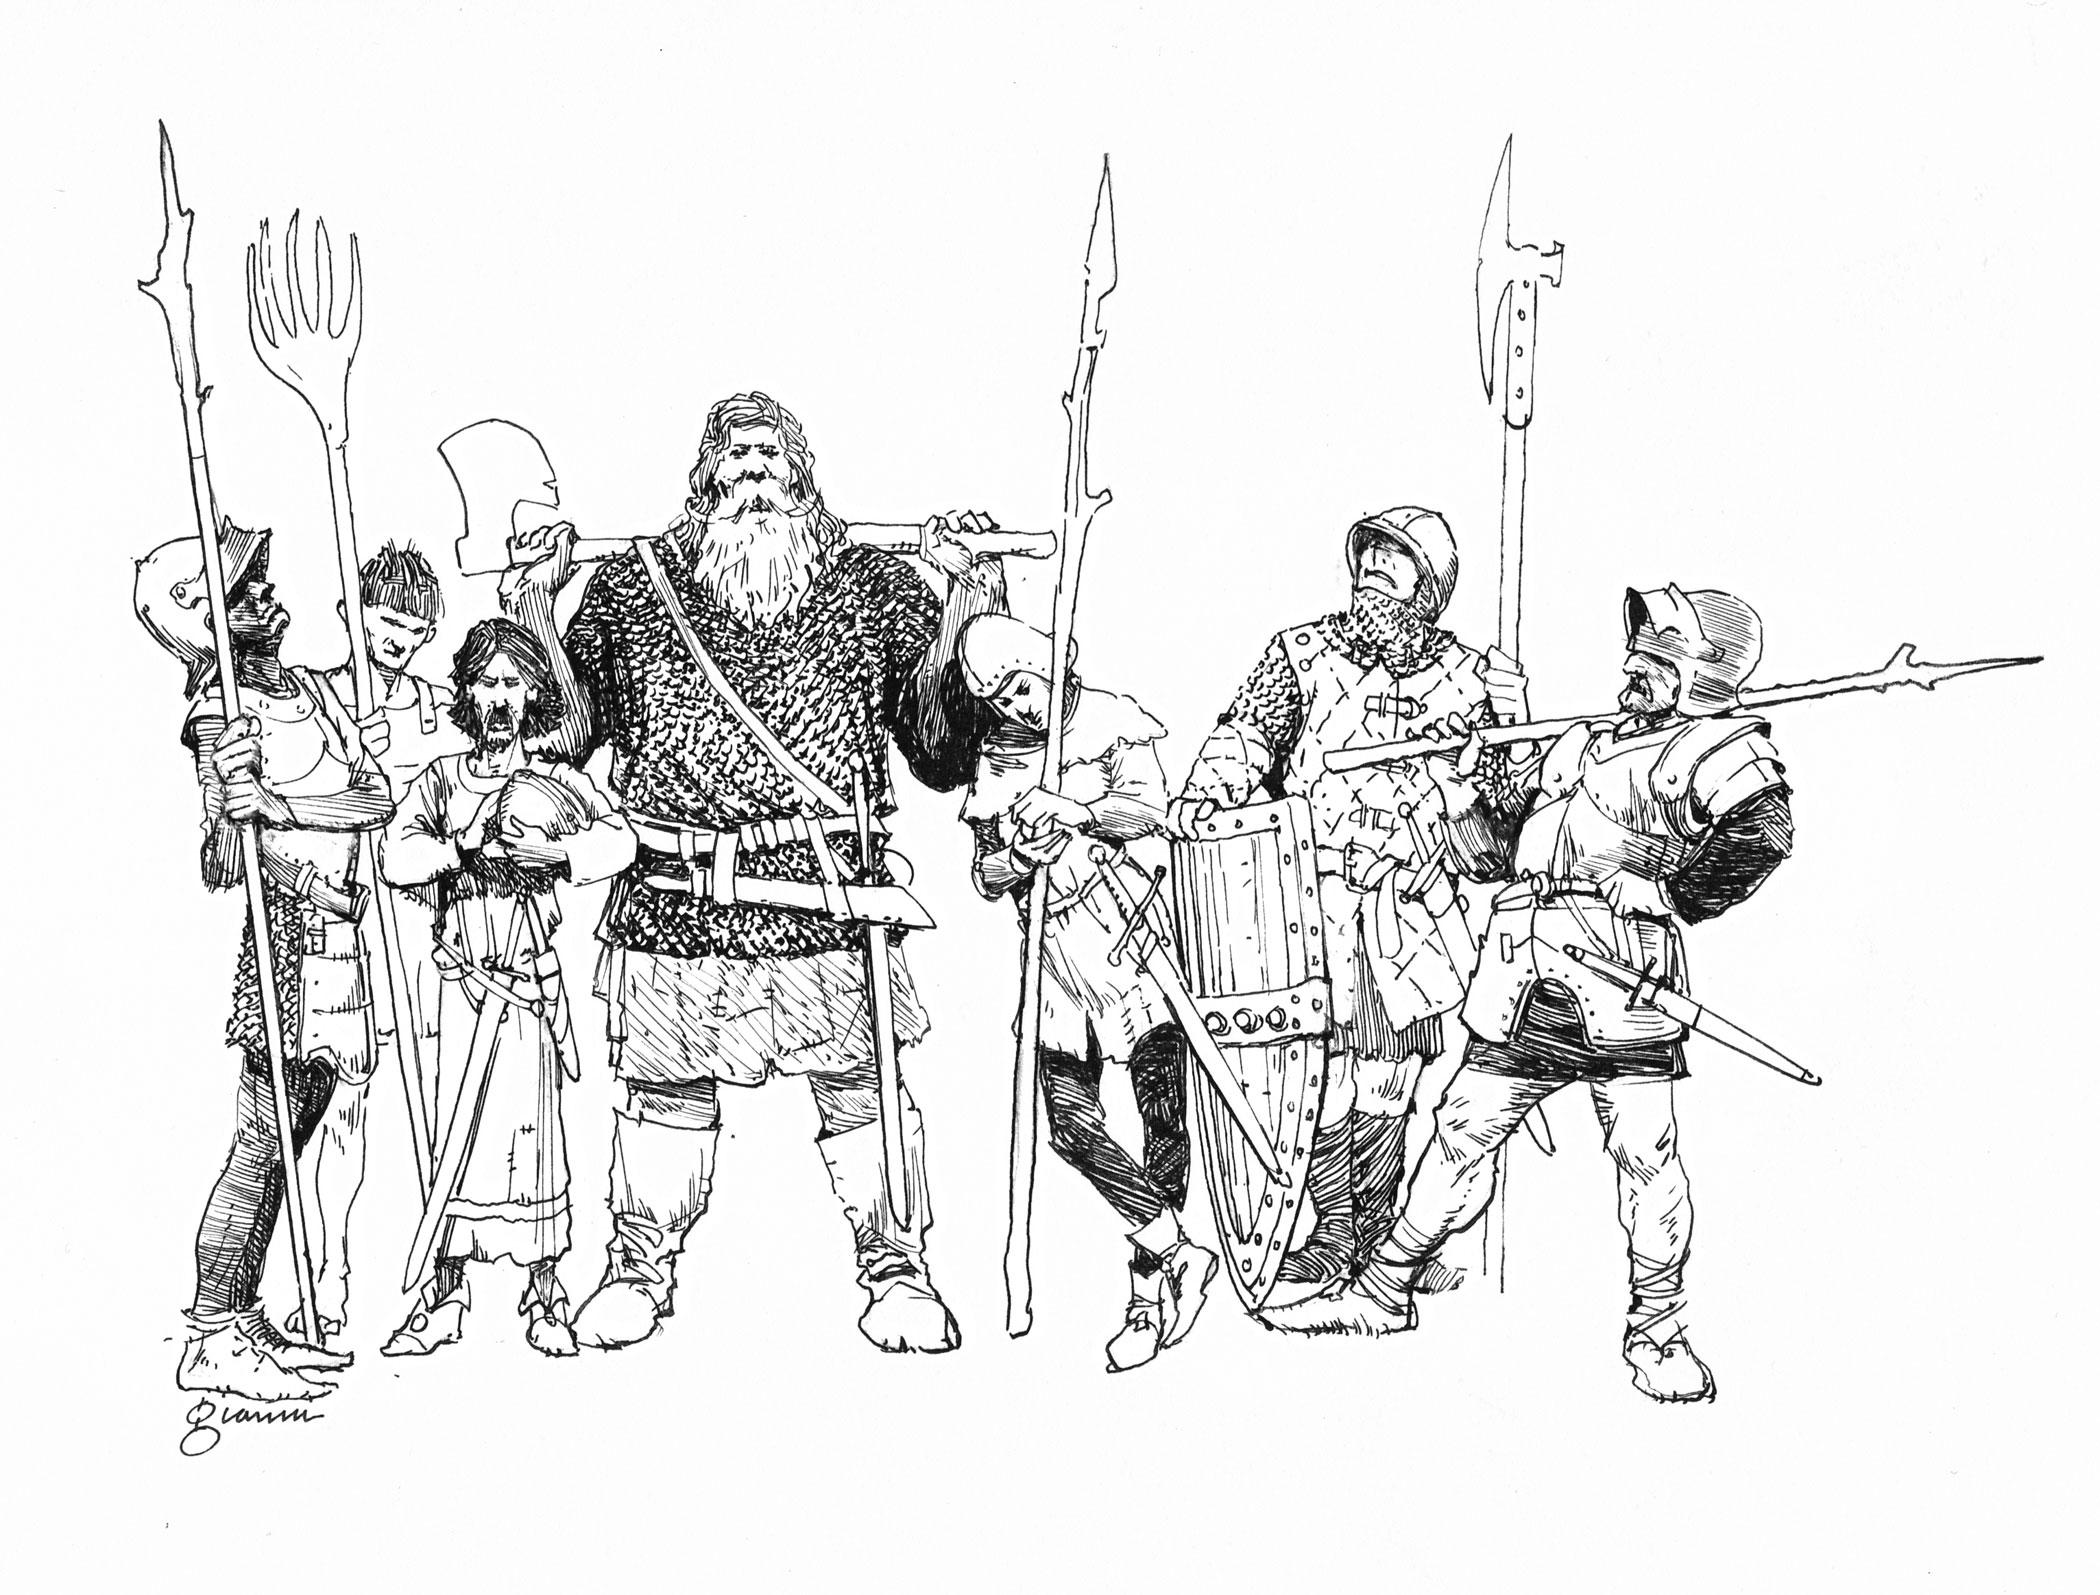 GARY GIANNI 2015 SEVEN KINGDOMS ILLUSTRATION Comic Art